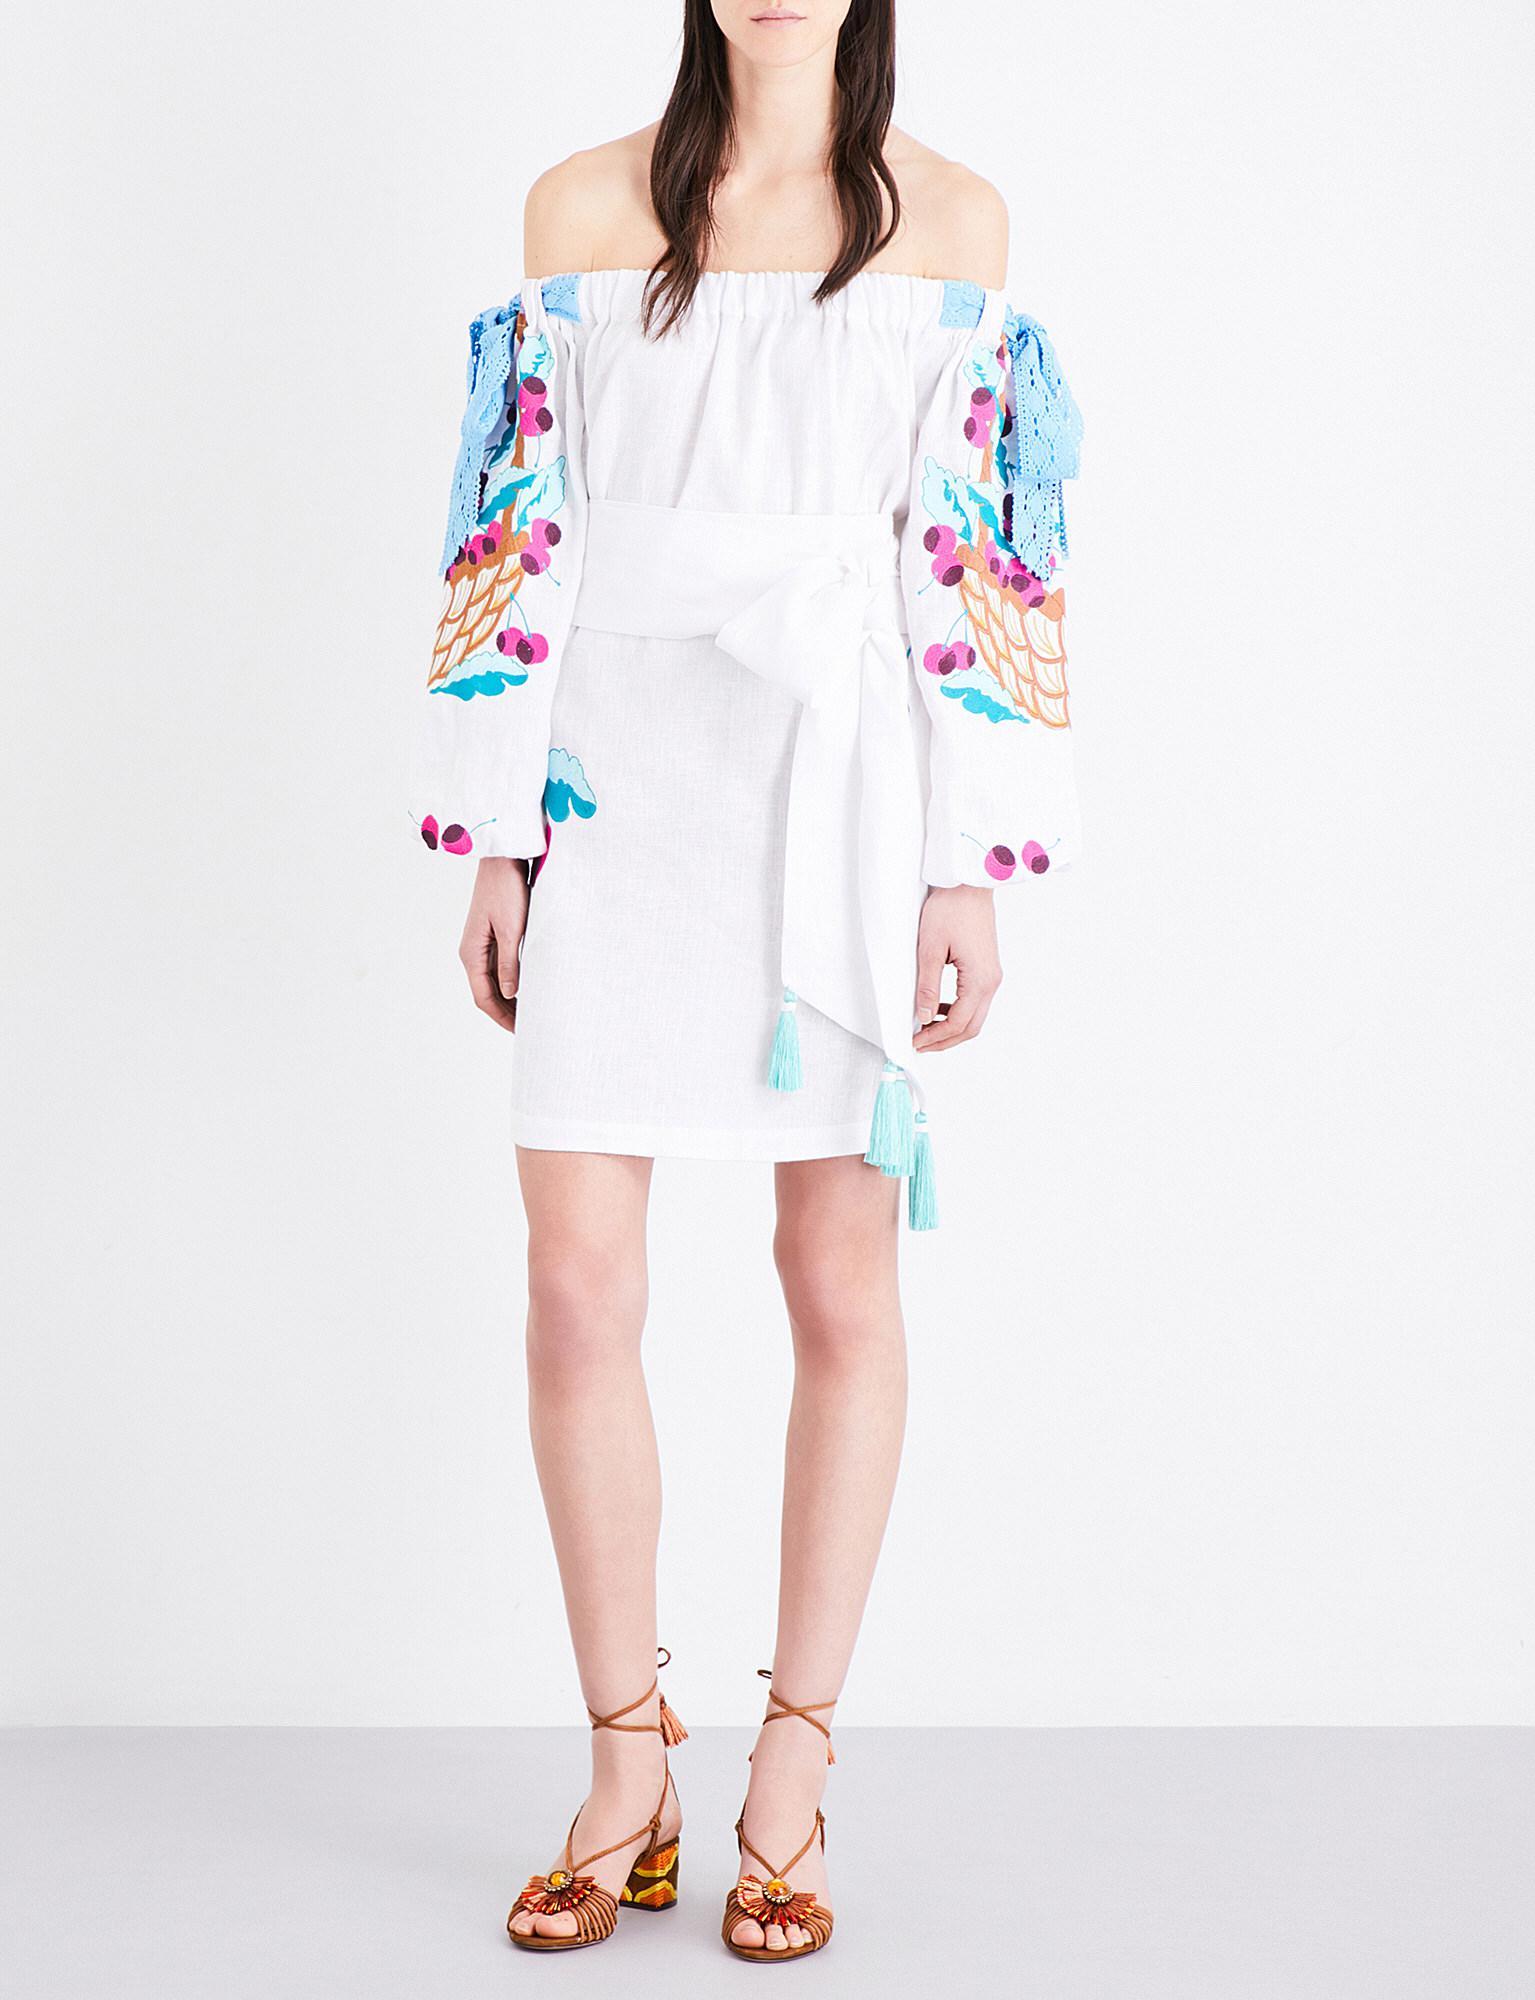 Embroidered mini dress Yuliya Magdych fh5kJ1